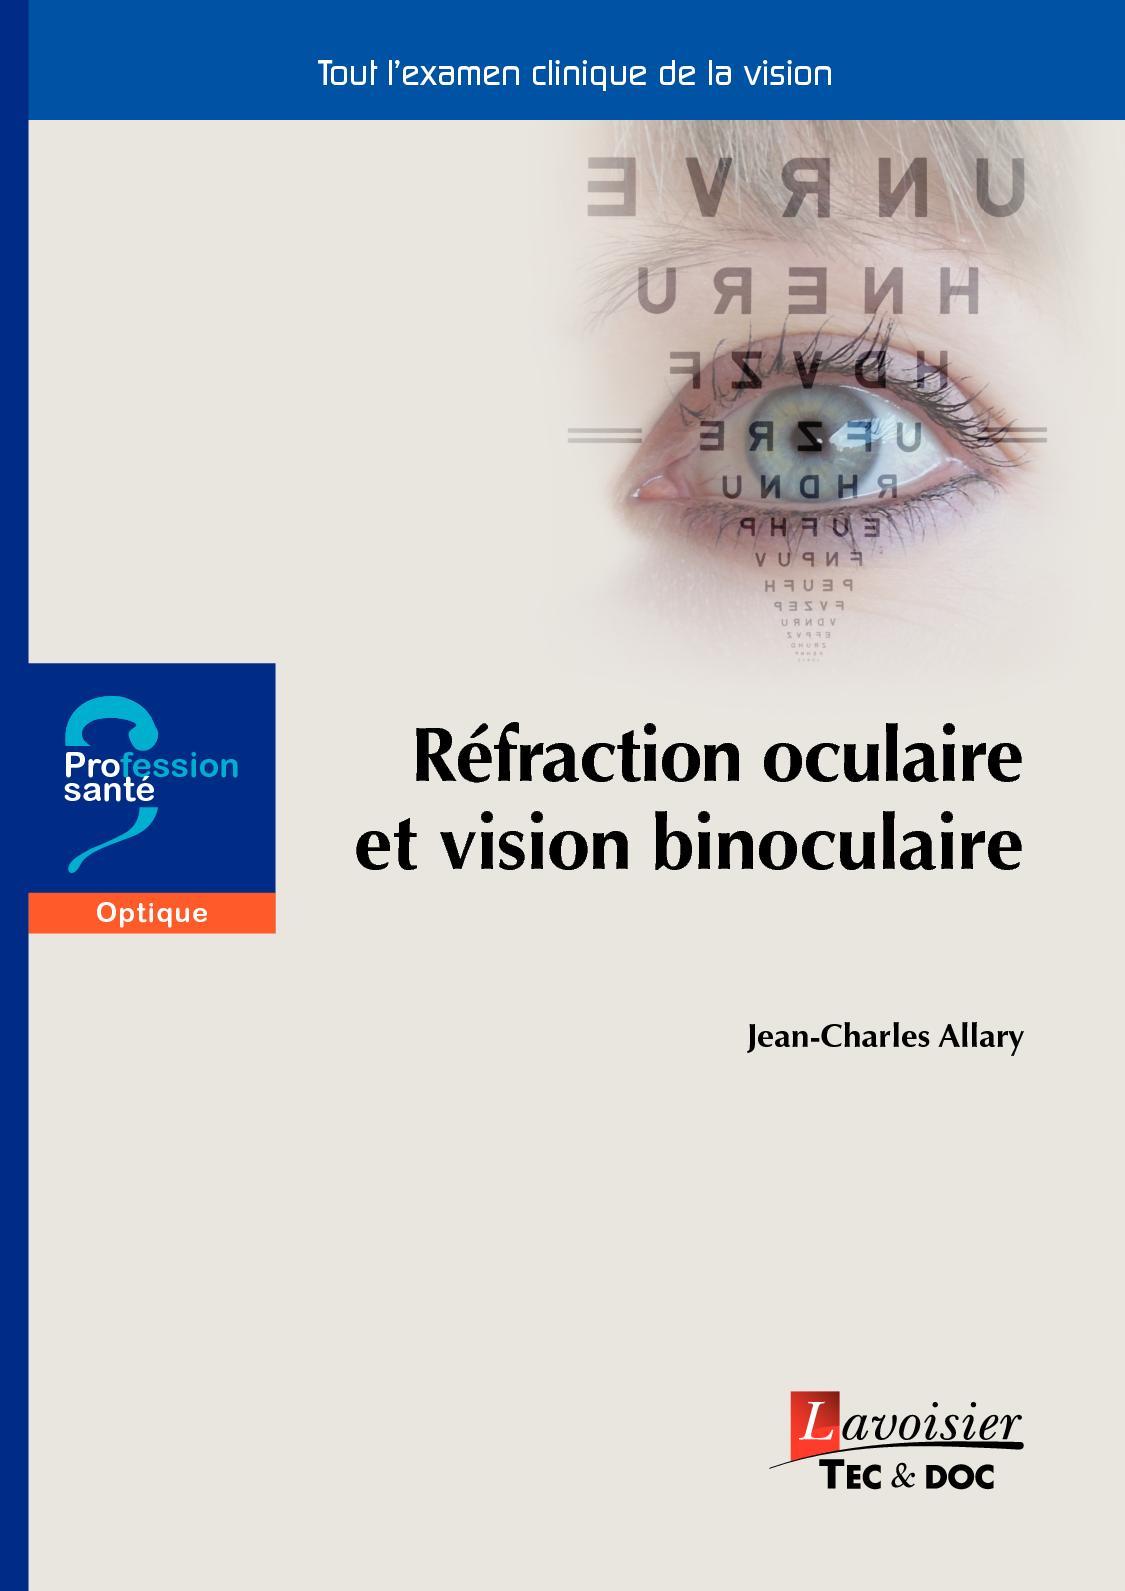 Calaméo - Réfraction oculaire et vision binoculaire, ALLARY Jean-Charles -  Pages liminaires 1feae29a360d